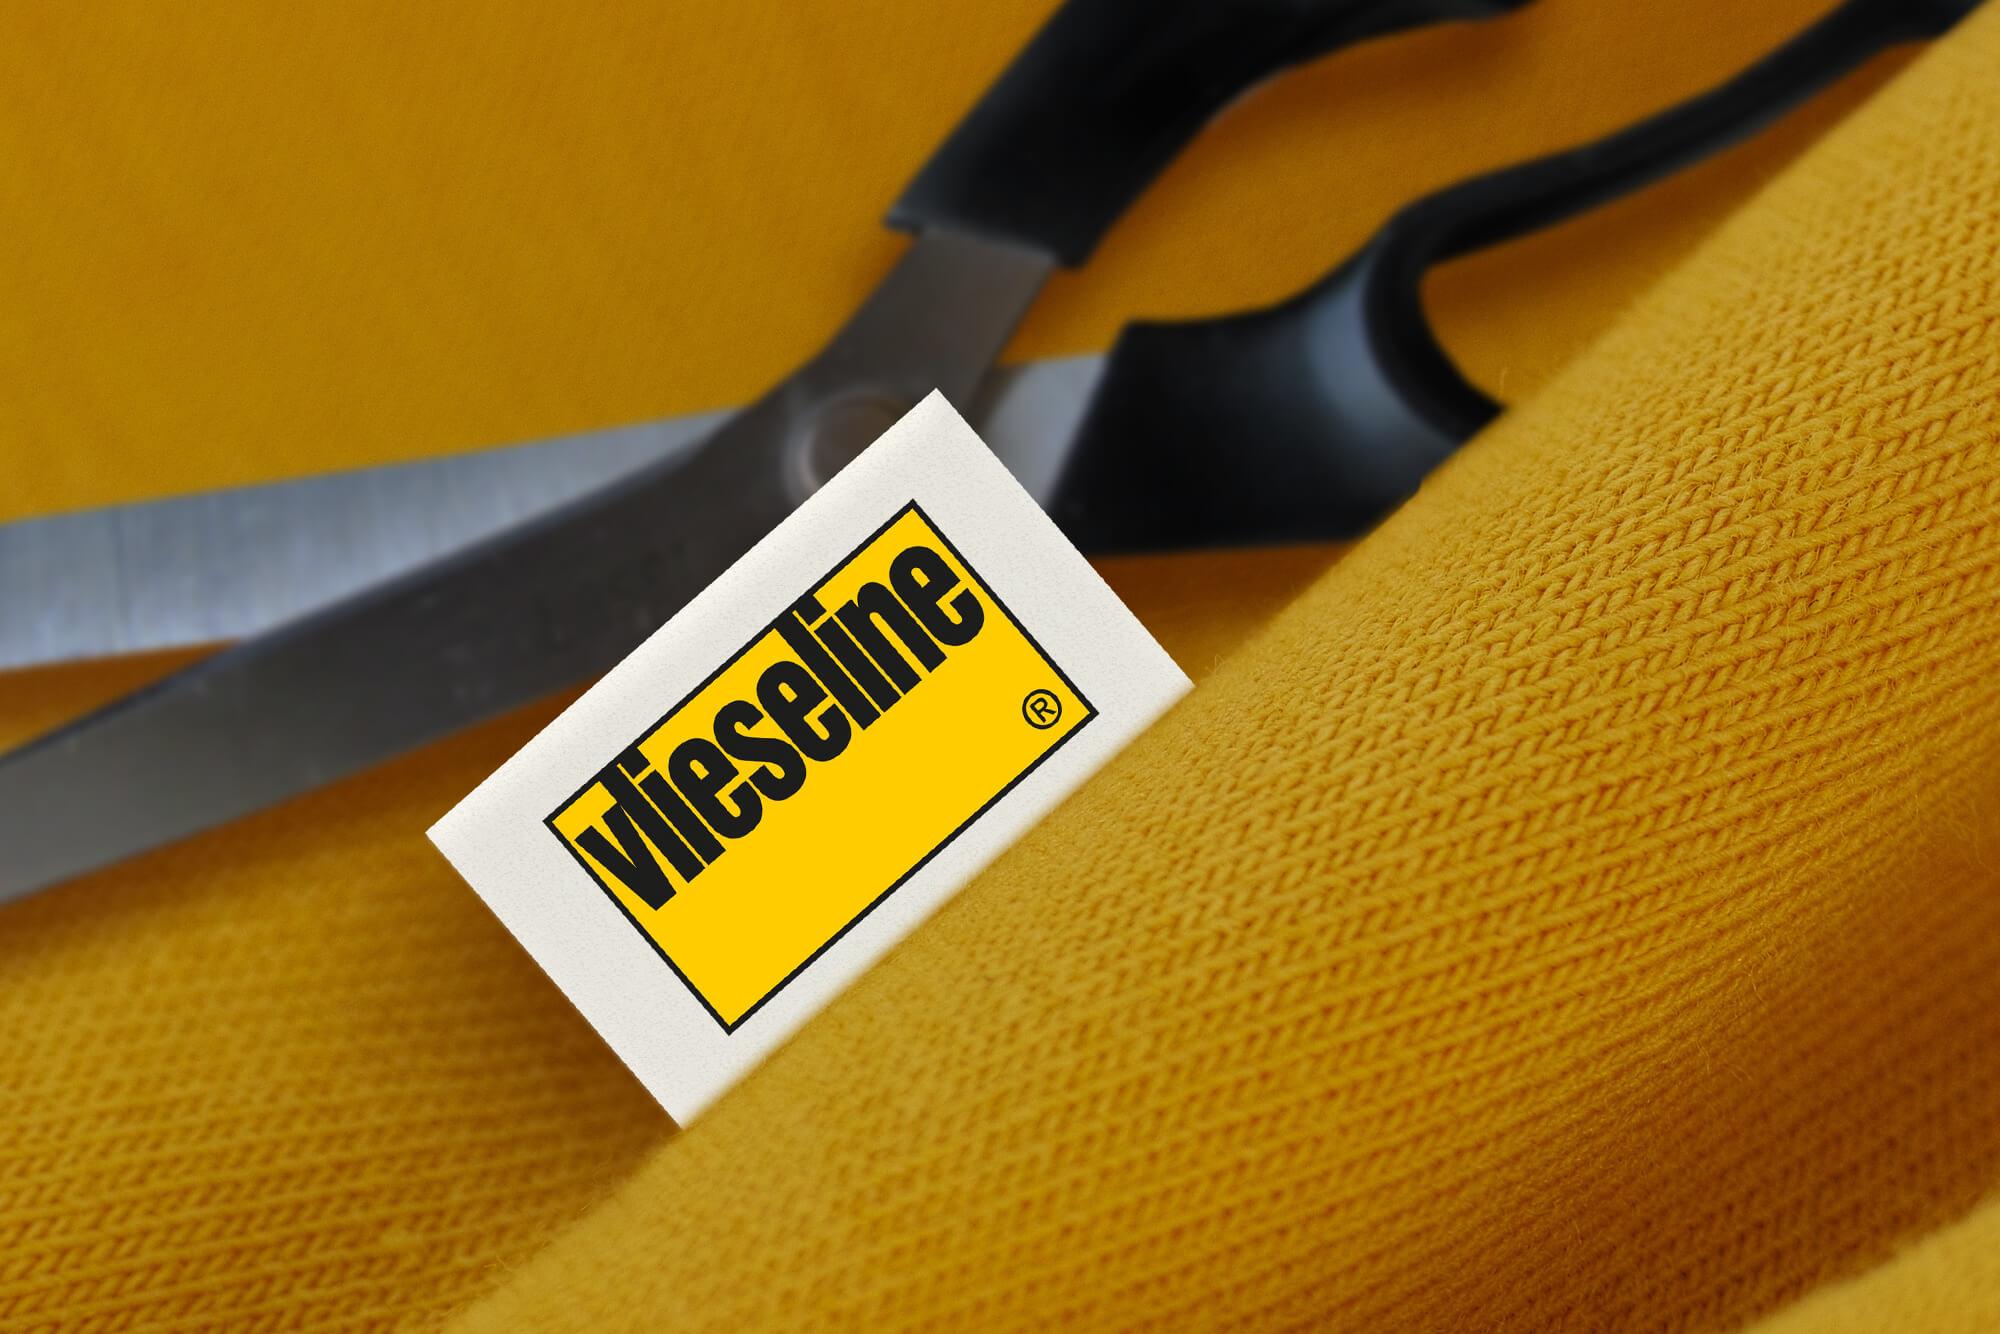 Vlieseline Verpackungsdesign-Relaunch